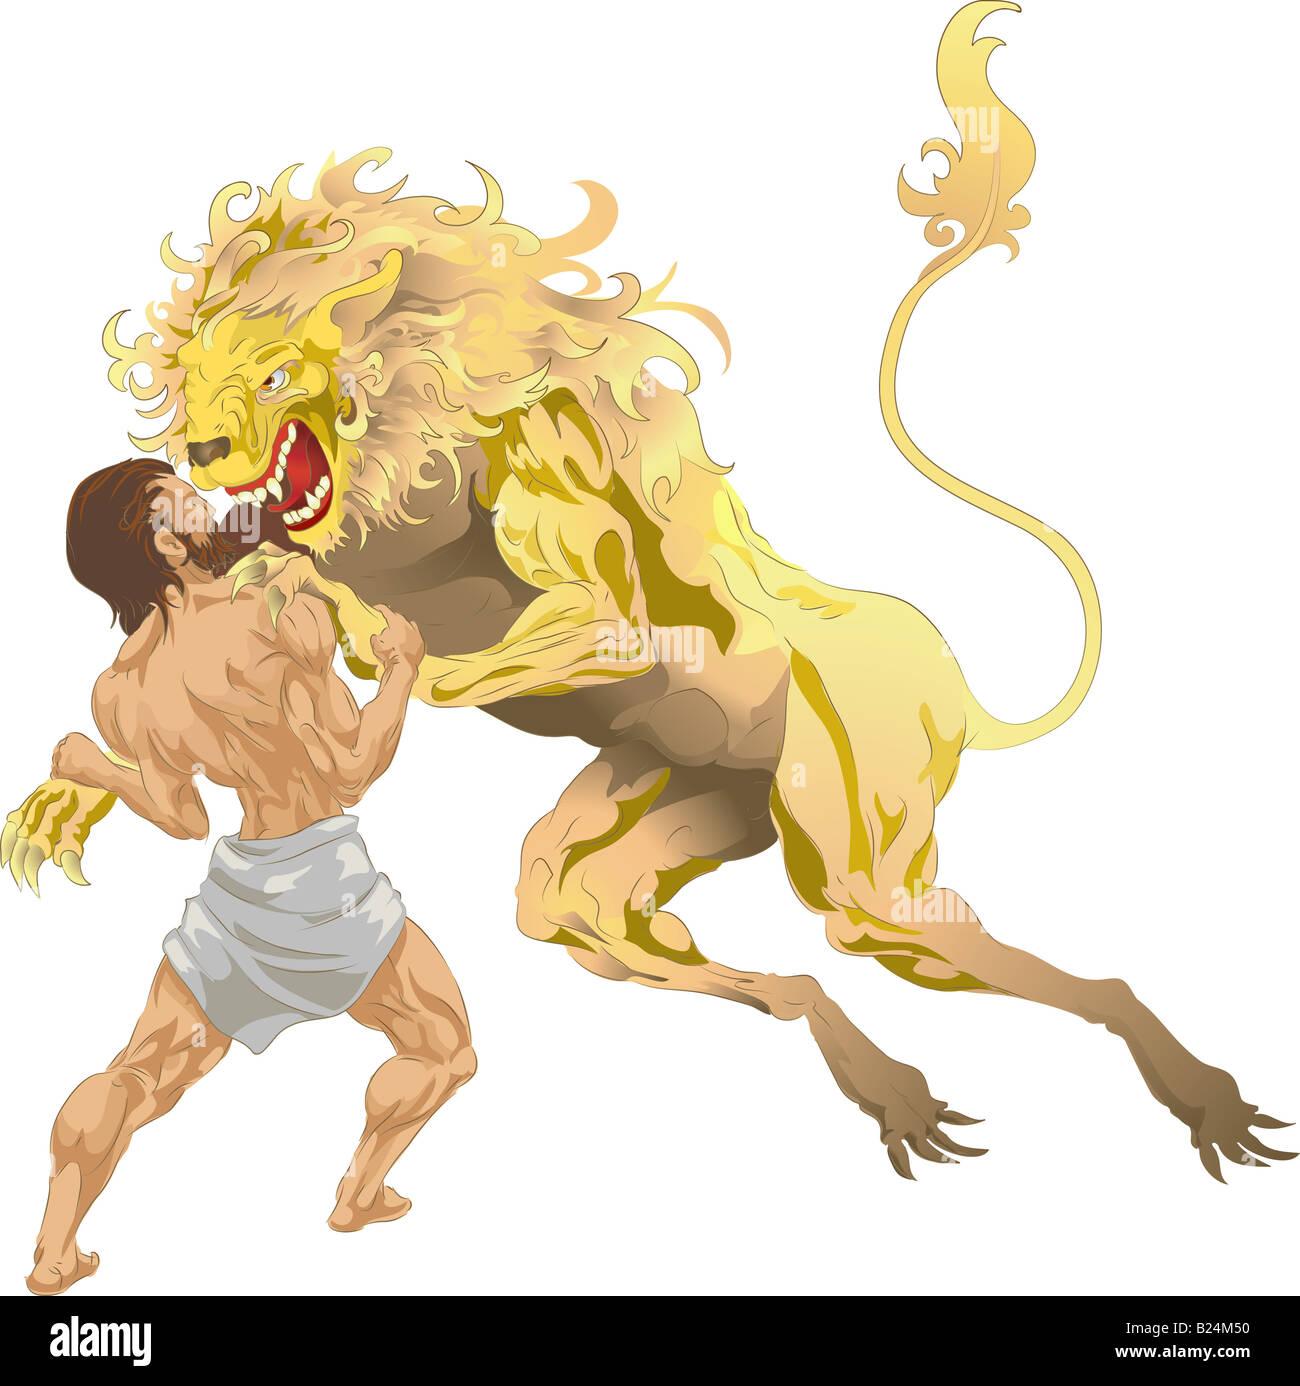 Hercules fist labor